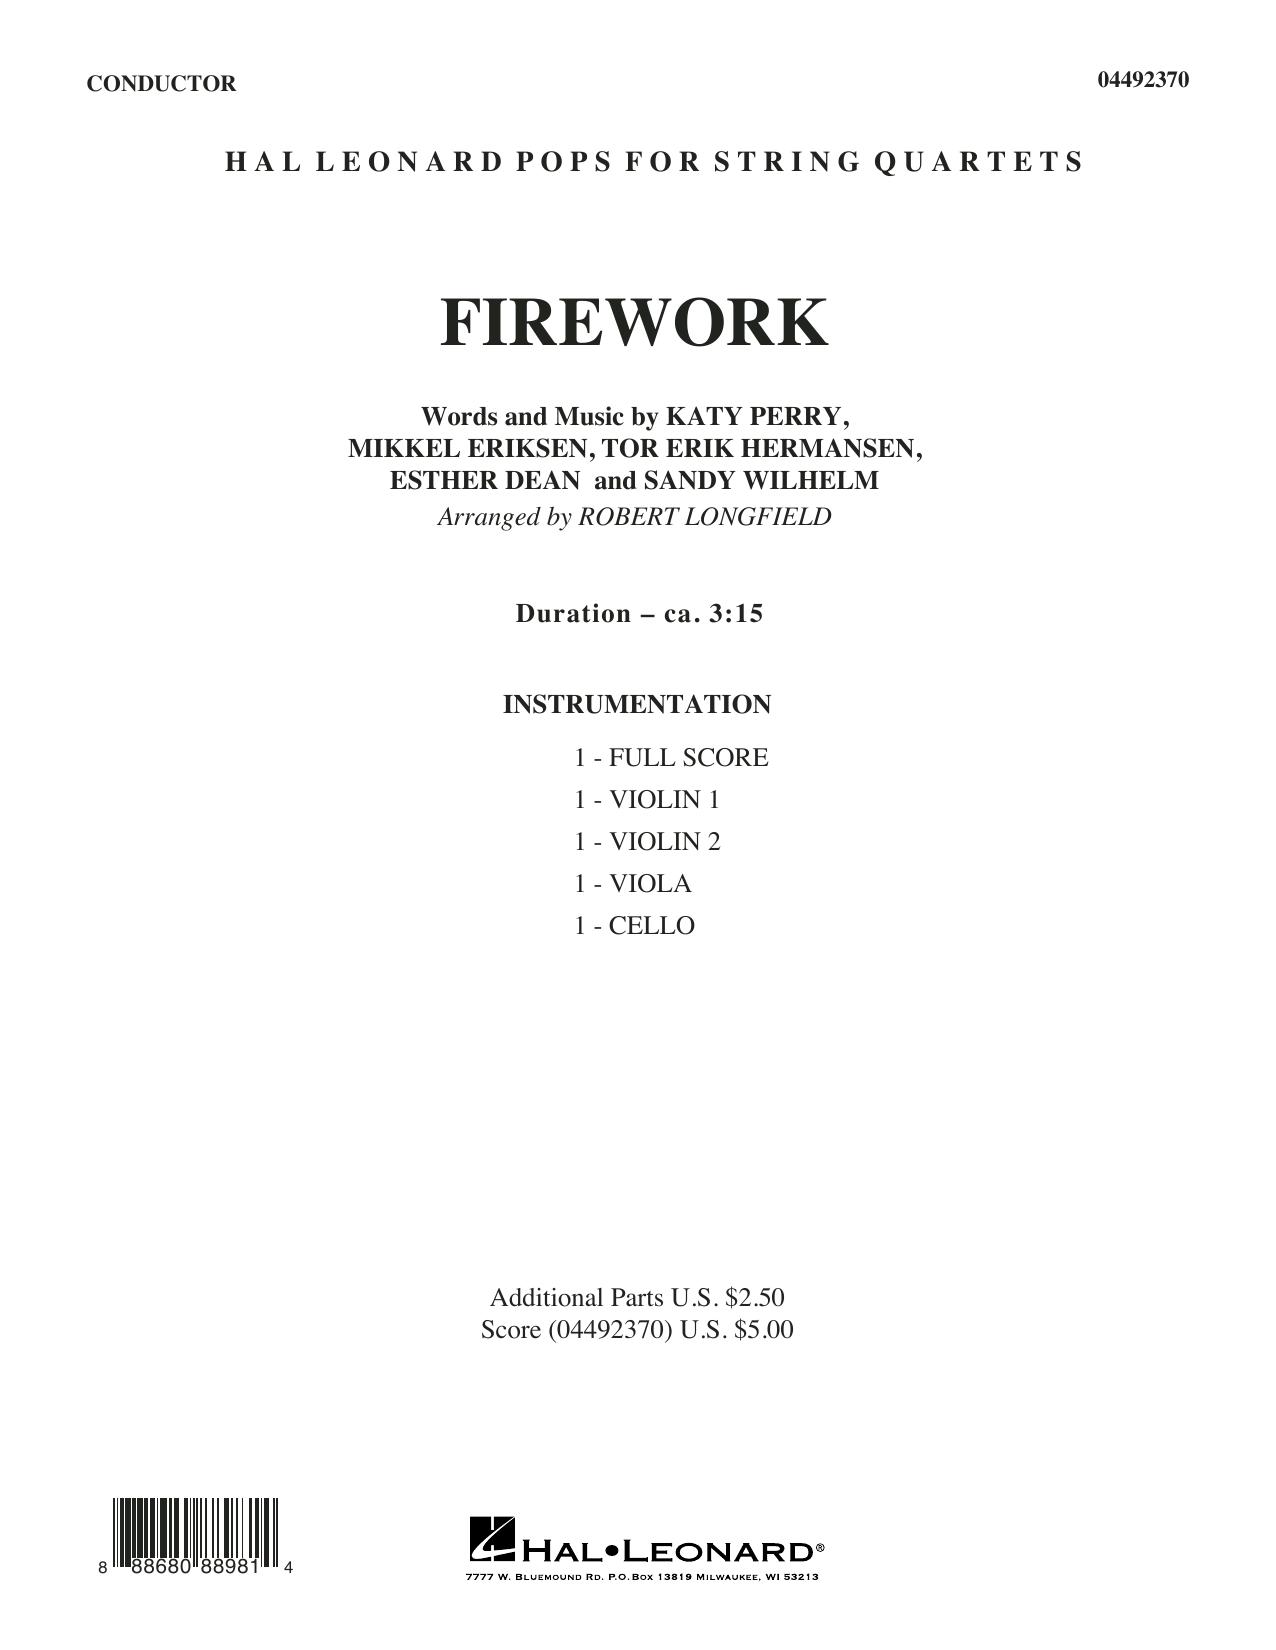 Firework (arr. Robert Longfield) - Conductor Score (Full Score) (Orchestra)